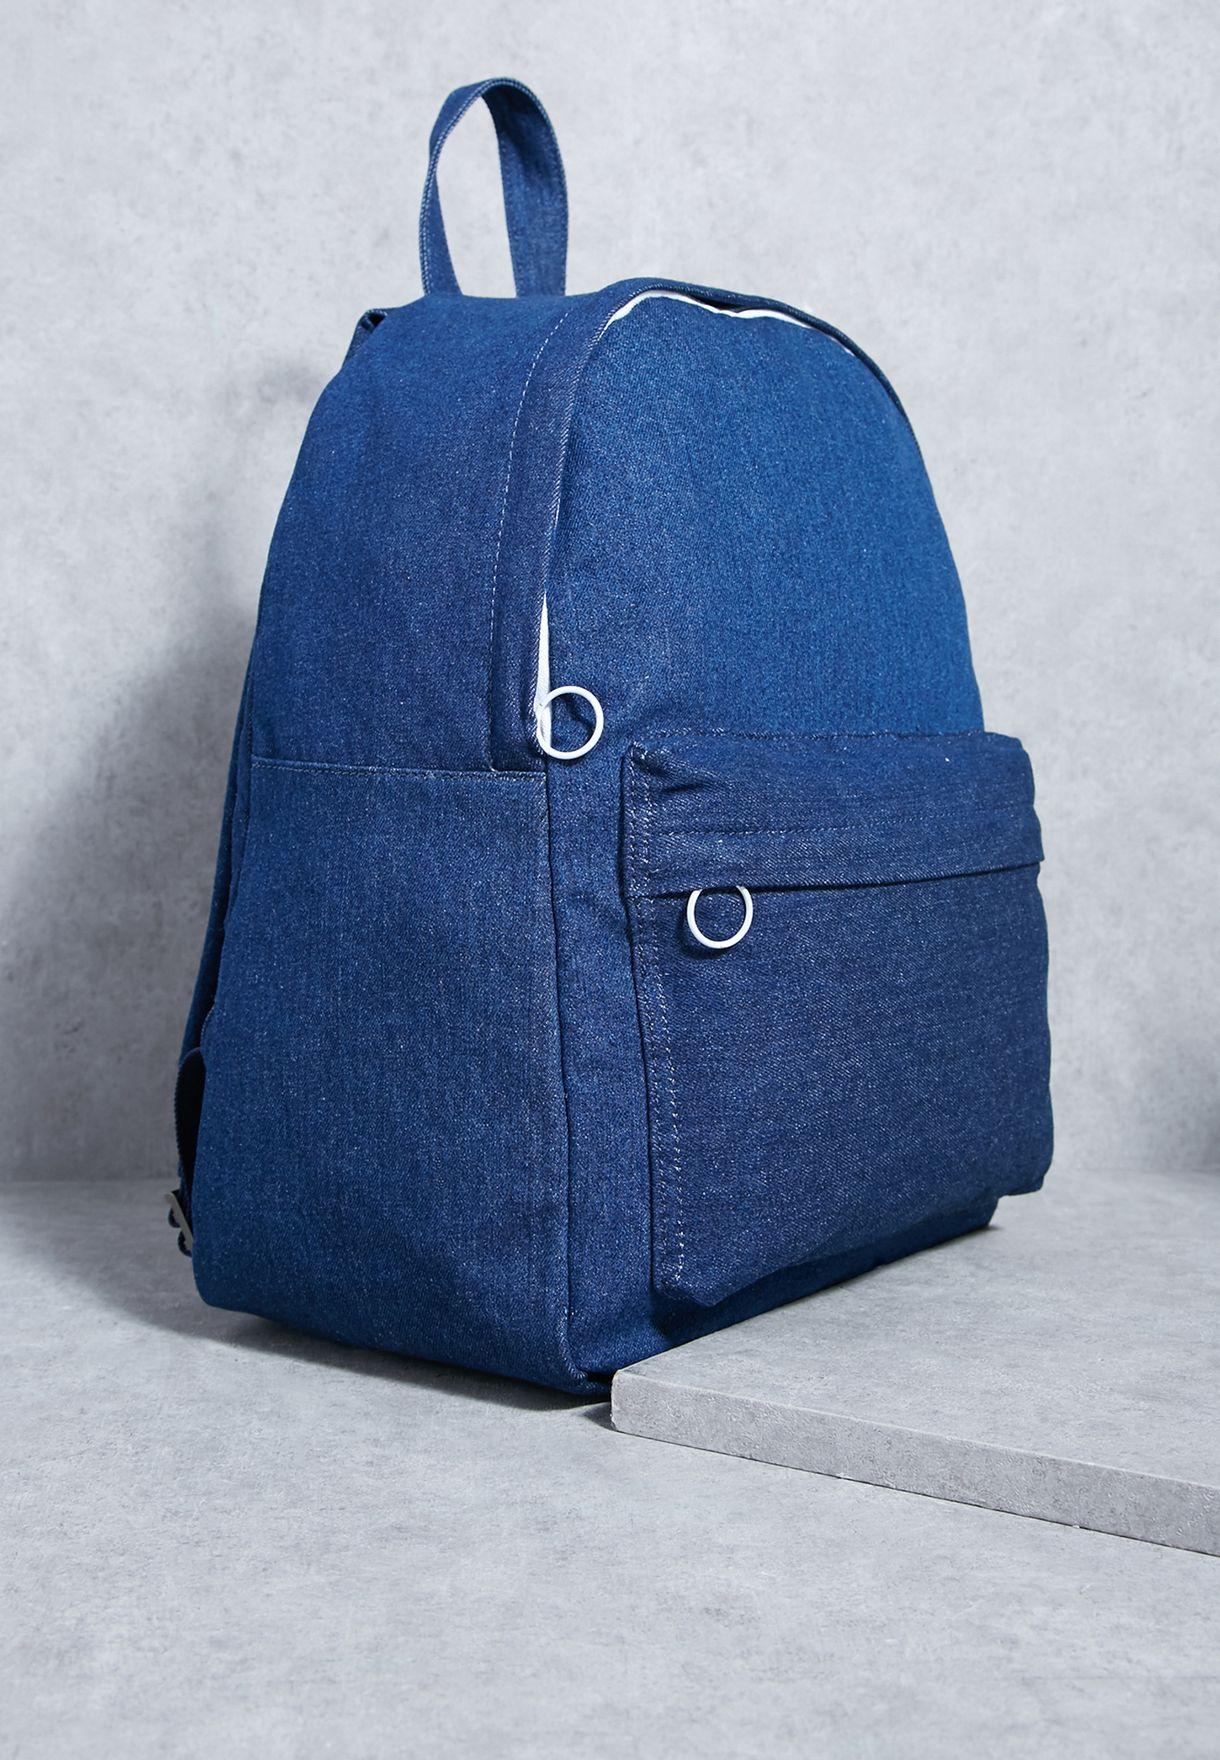 1510ebfa8f05e تسوق شنطة ظهر جينز ماركة مانجو مان لون أزرق 14080661 في عمان ...